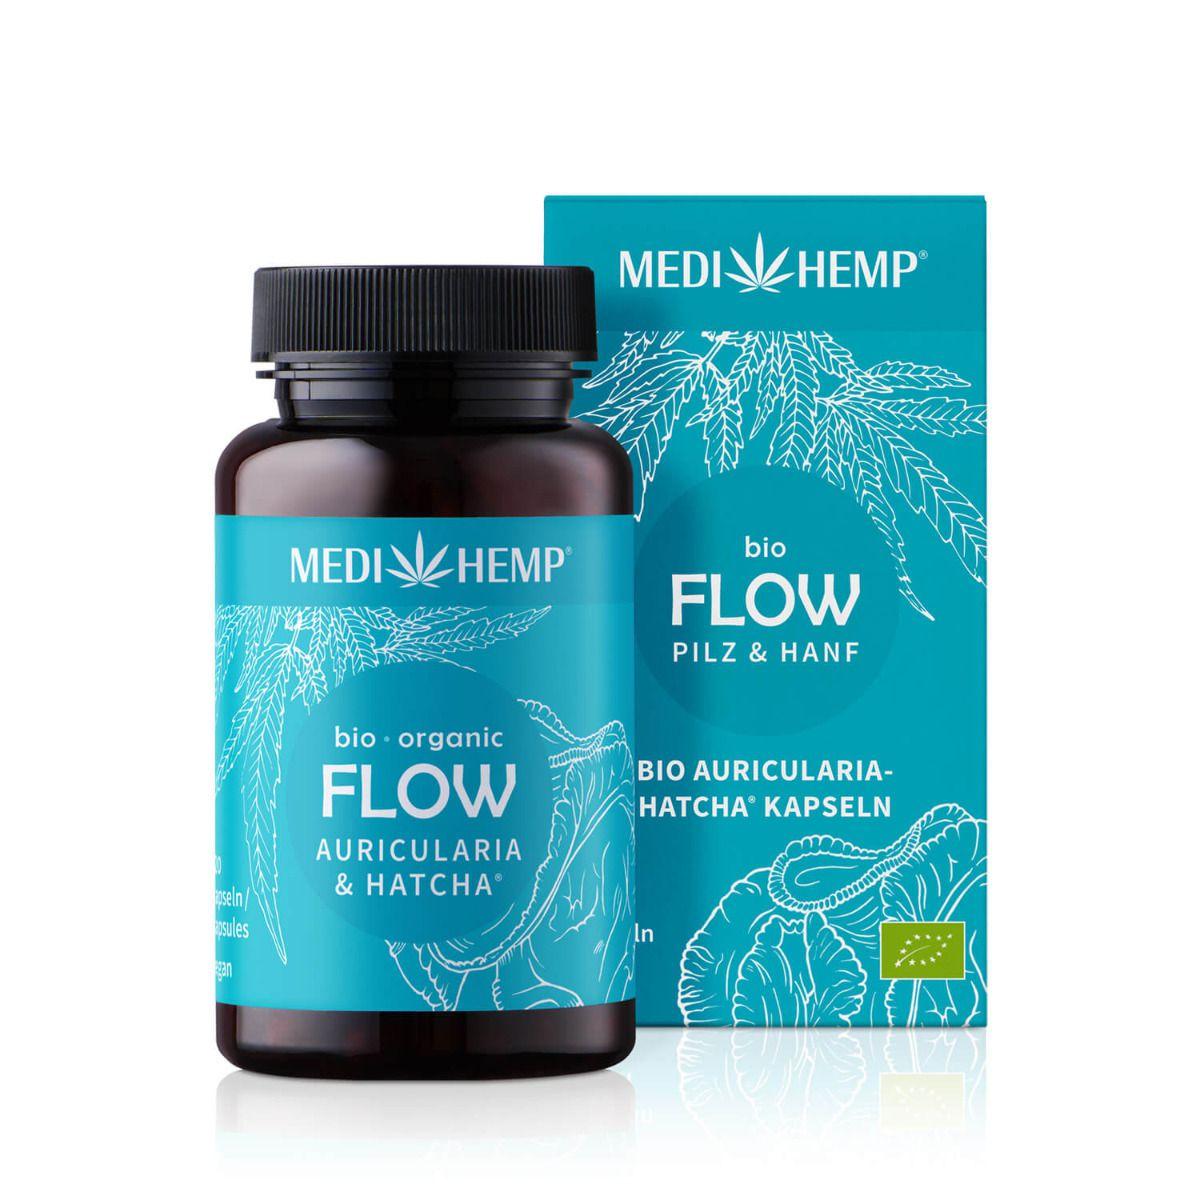 Bio FLOW Auricularia-HATCHA®, 120 Kapseln, vegan